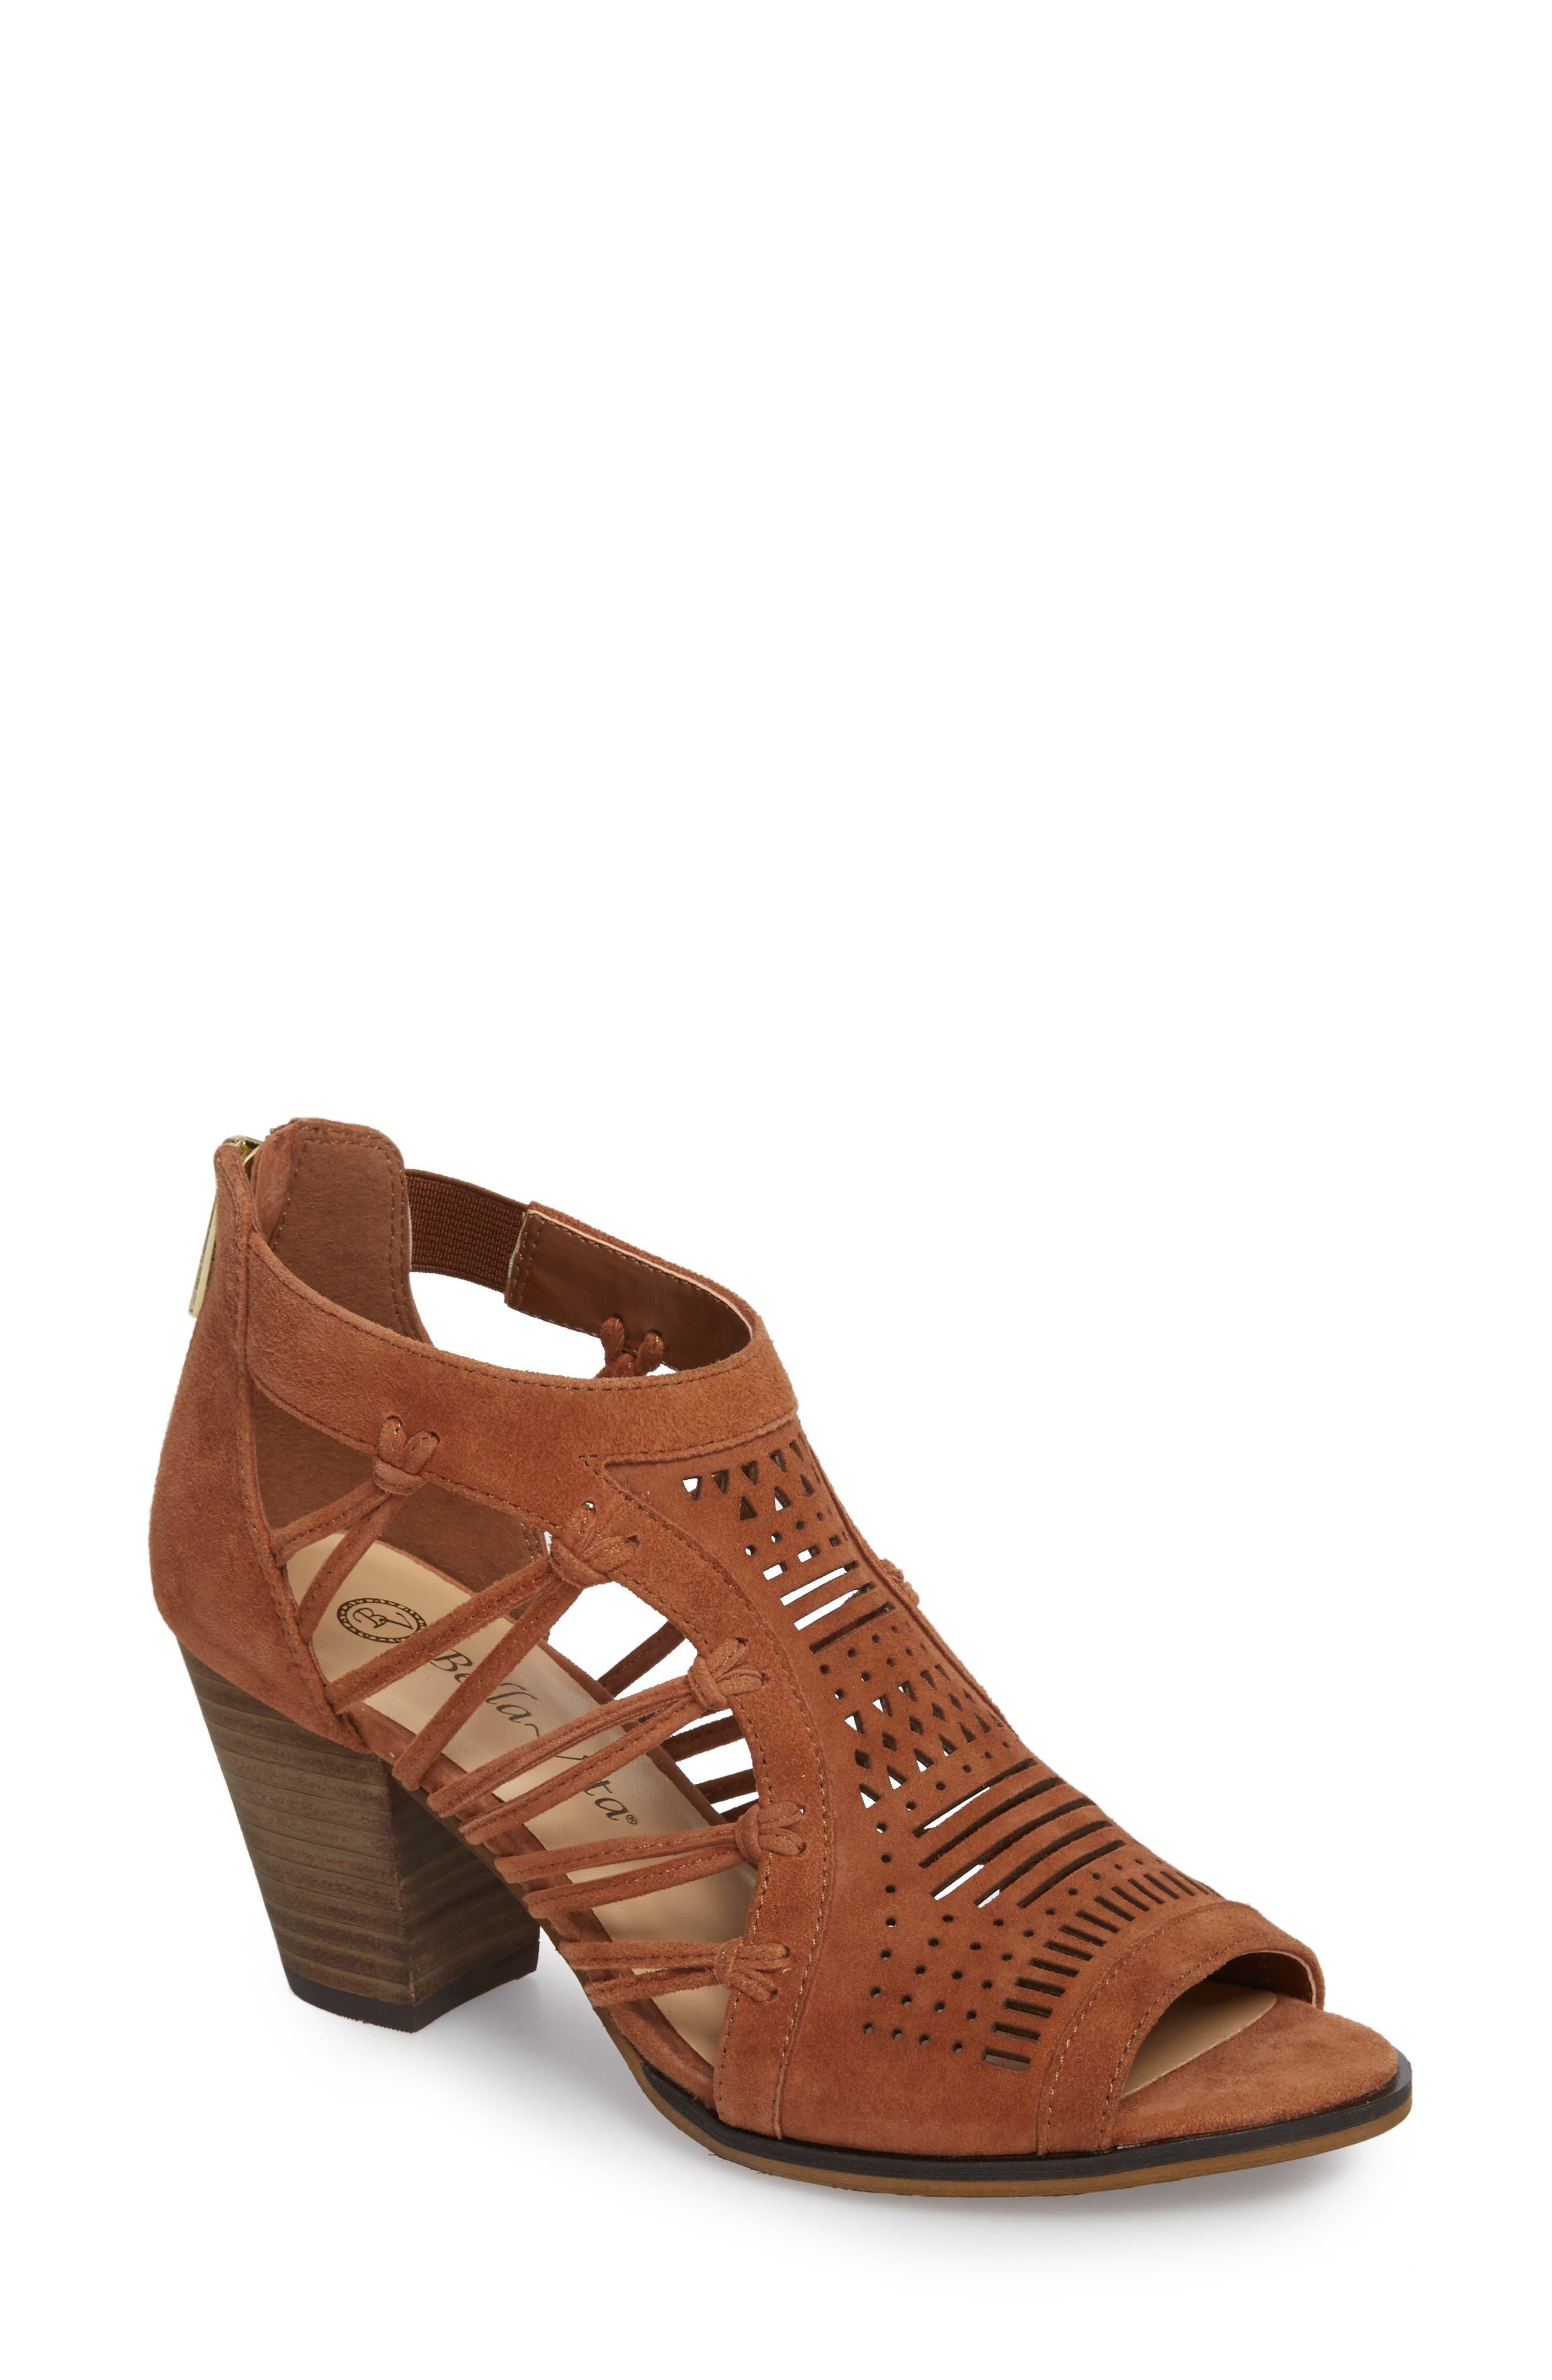 Kortez Block Heel Sandal,                         Main,                         color, Dark Tan Suede